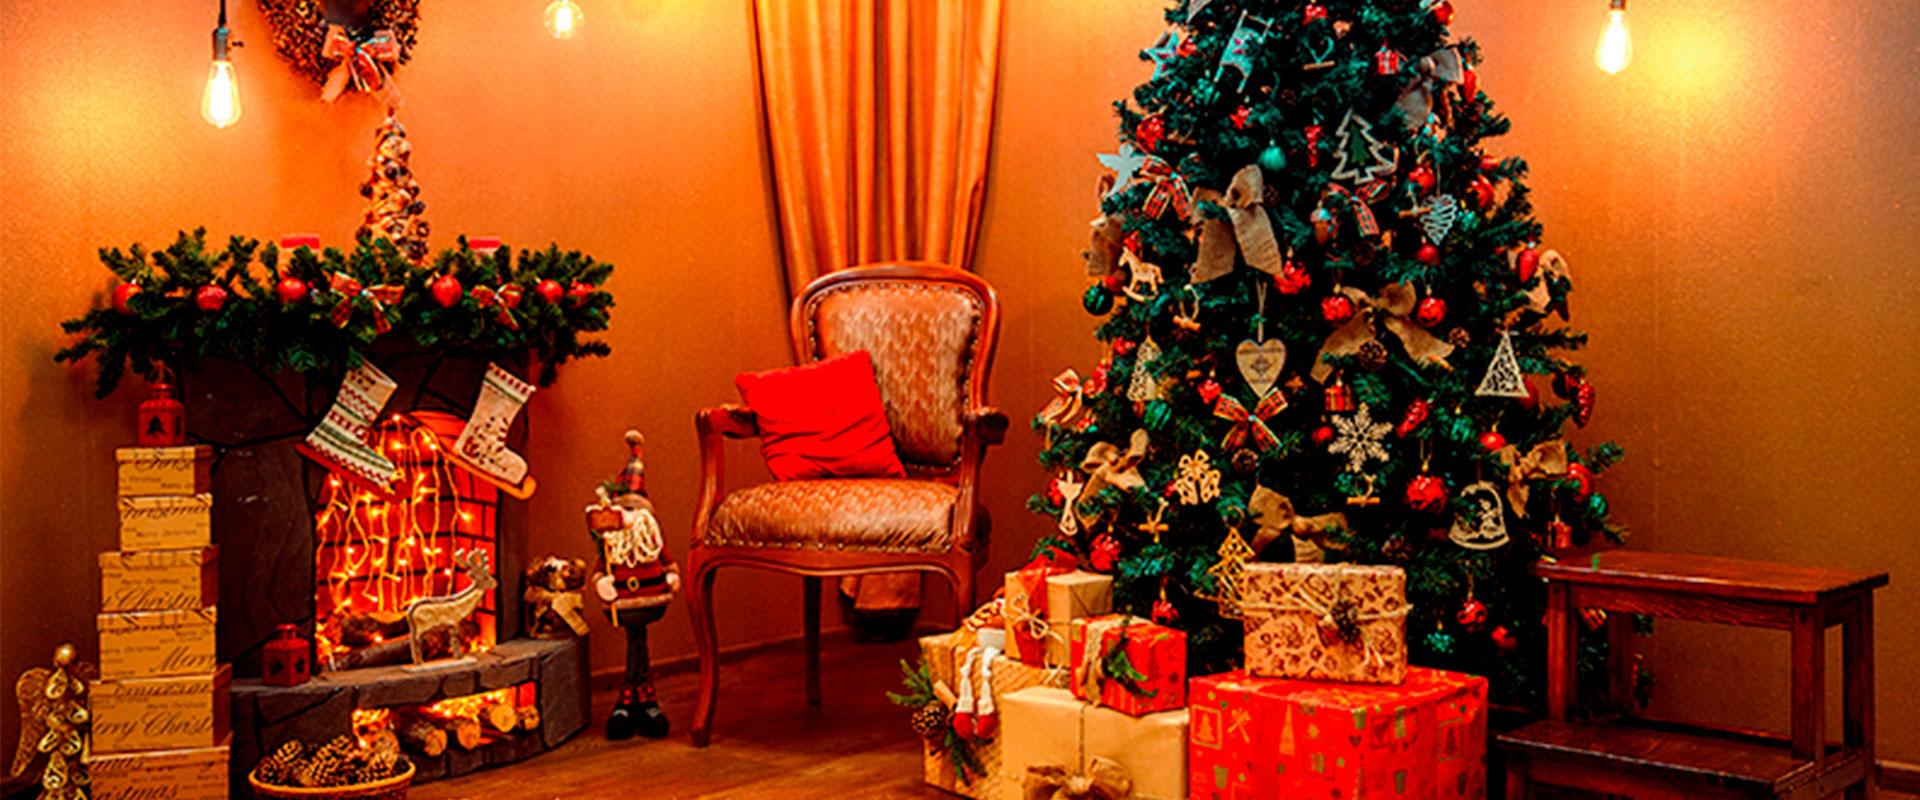 Fiesta de Navidad iluminada con Startastic.